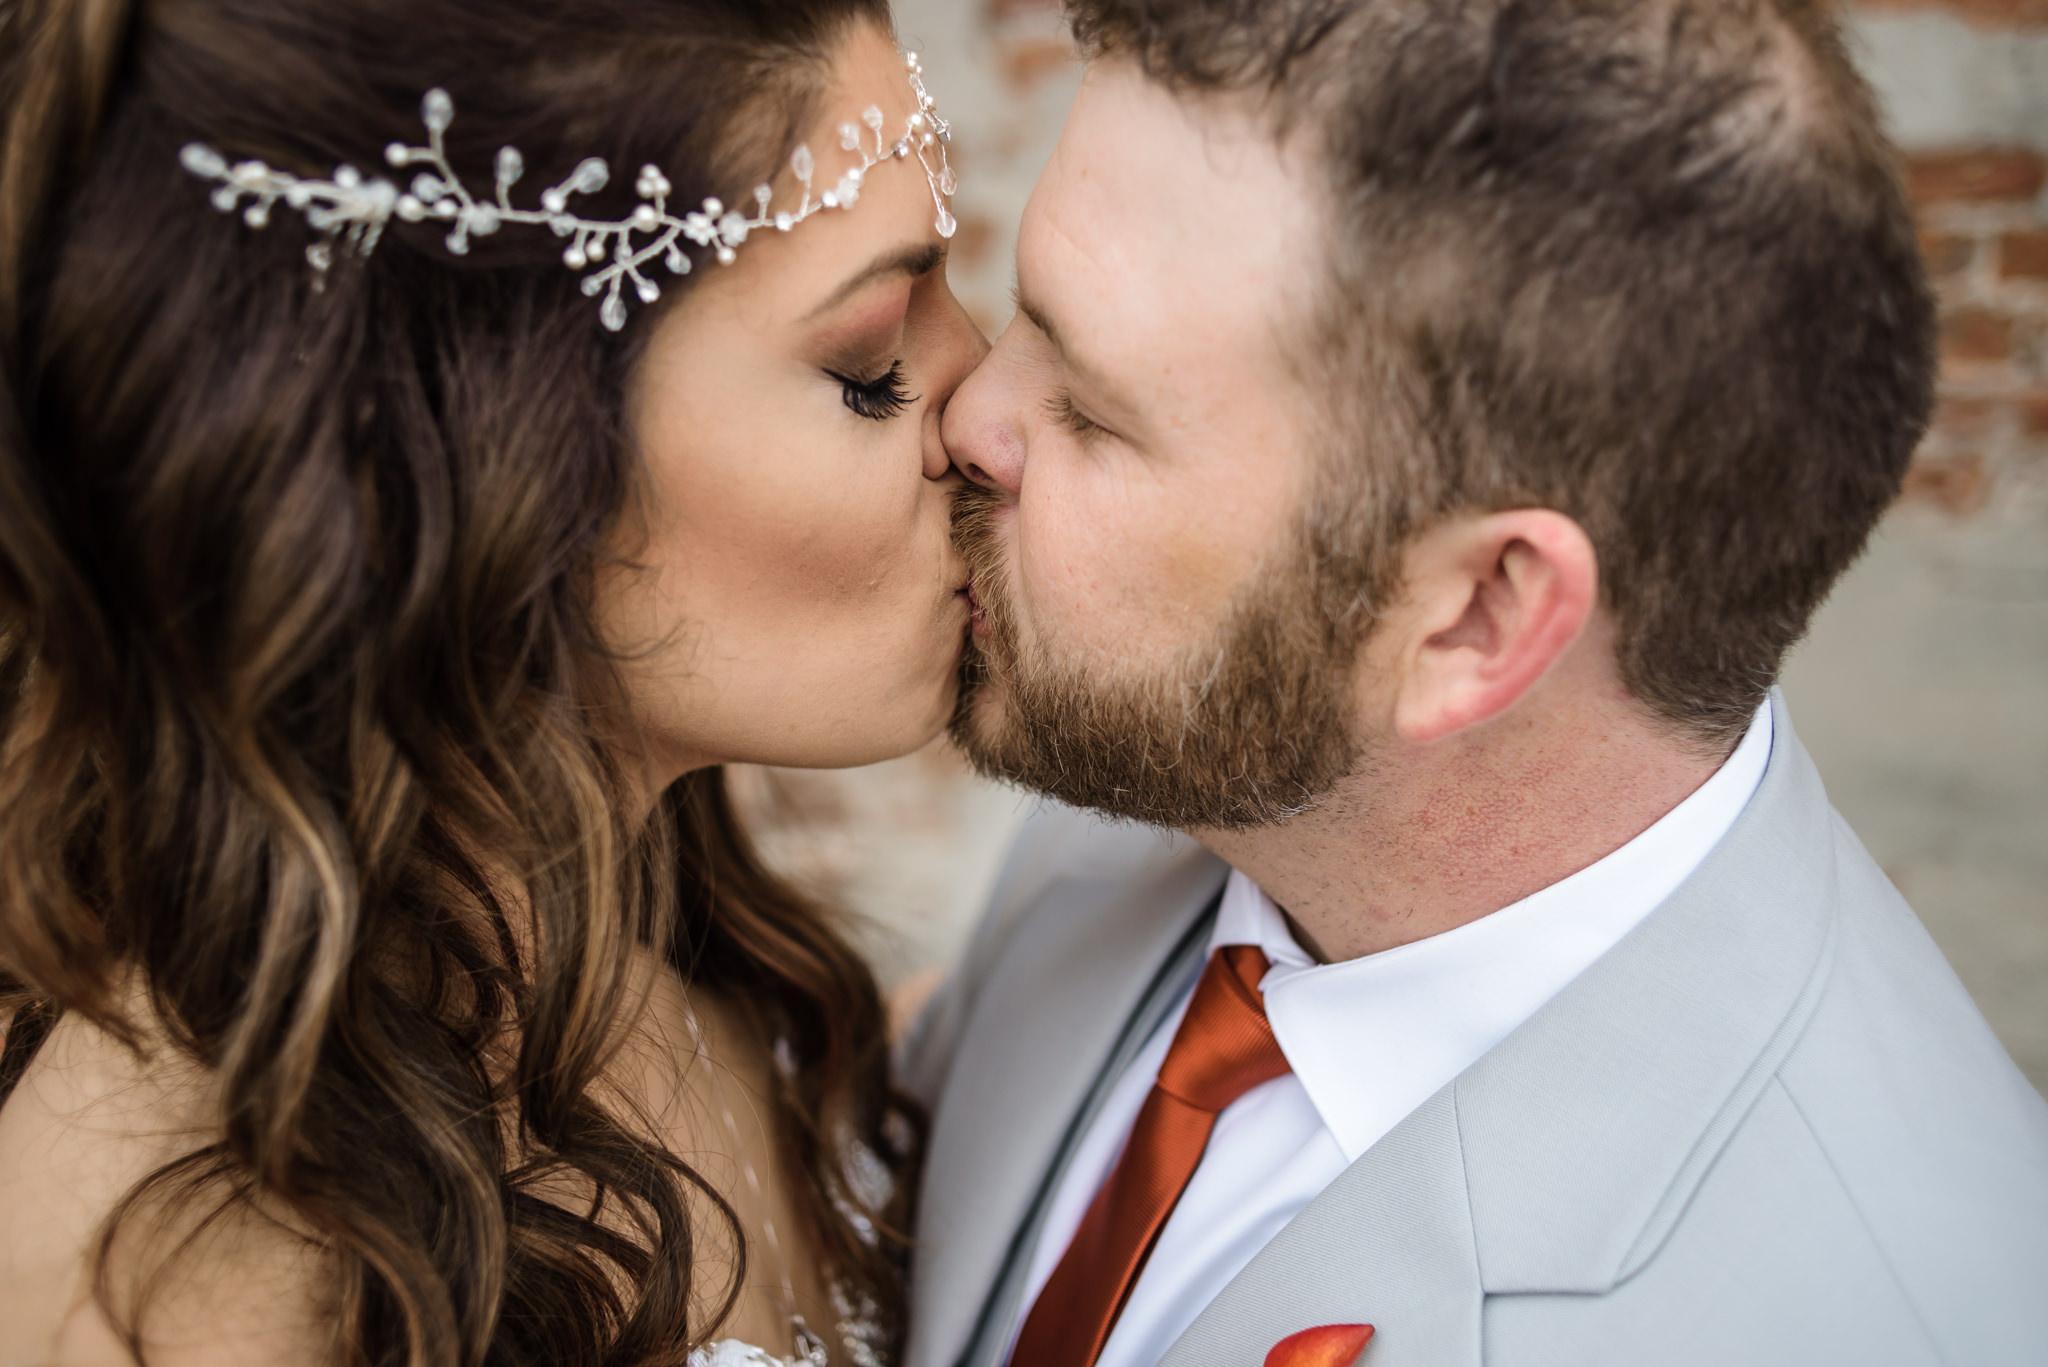 HILTON-OMAHA-WEDDING-PHOTOGRAPHER-JM-STUDIOS-OMAHA-LIV-BRICE-015.jpg